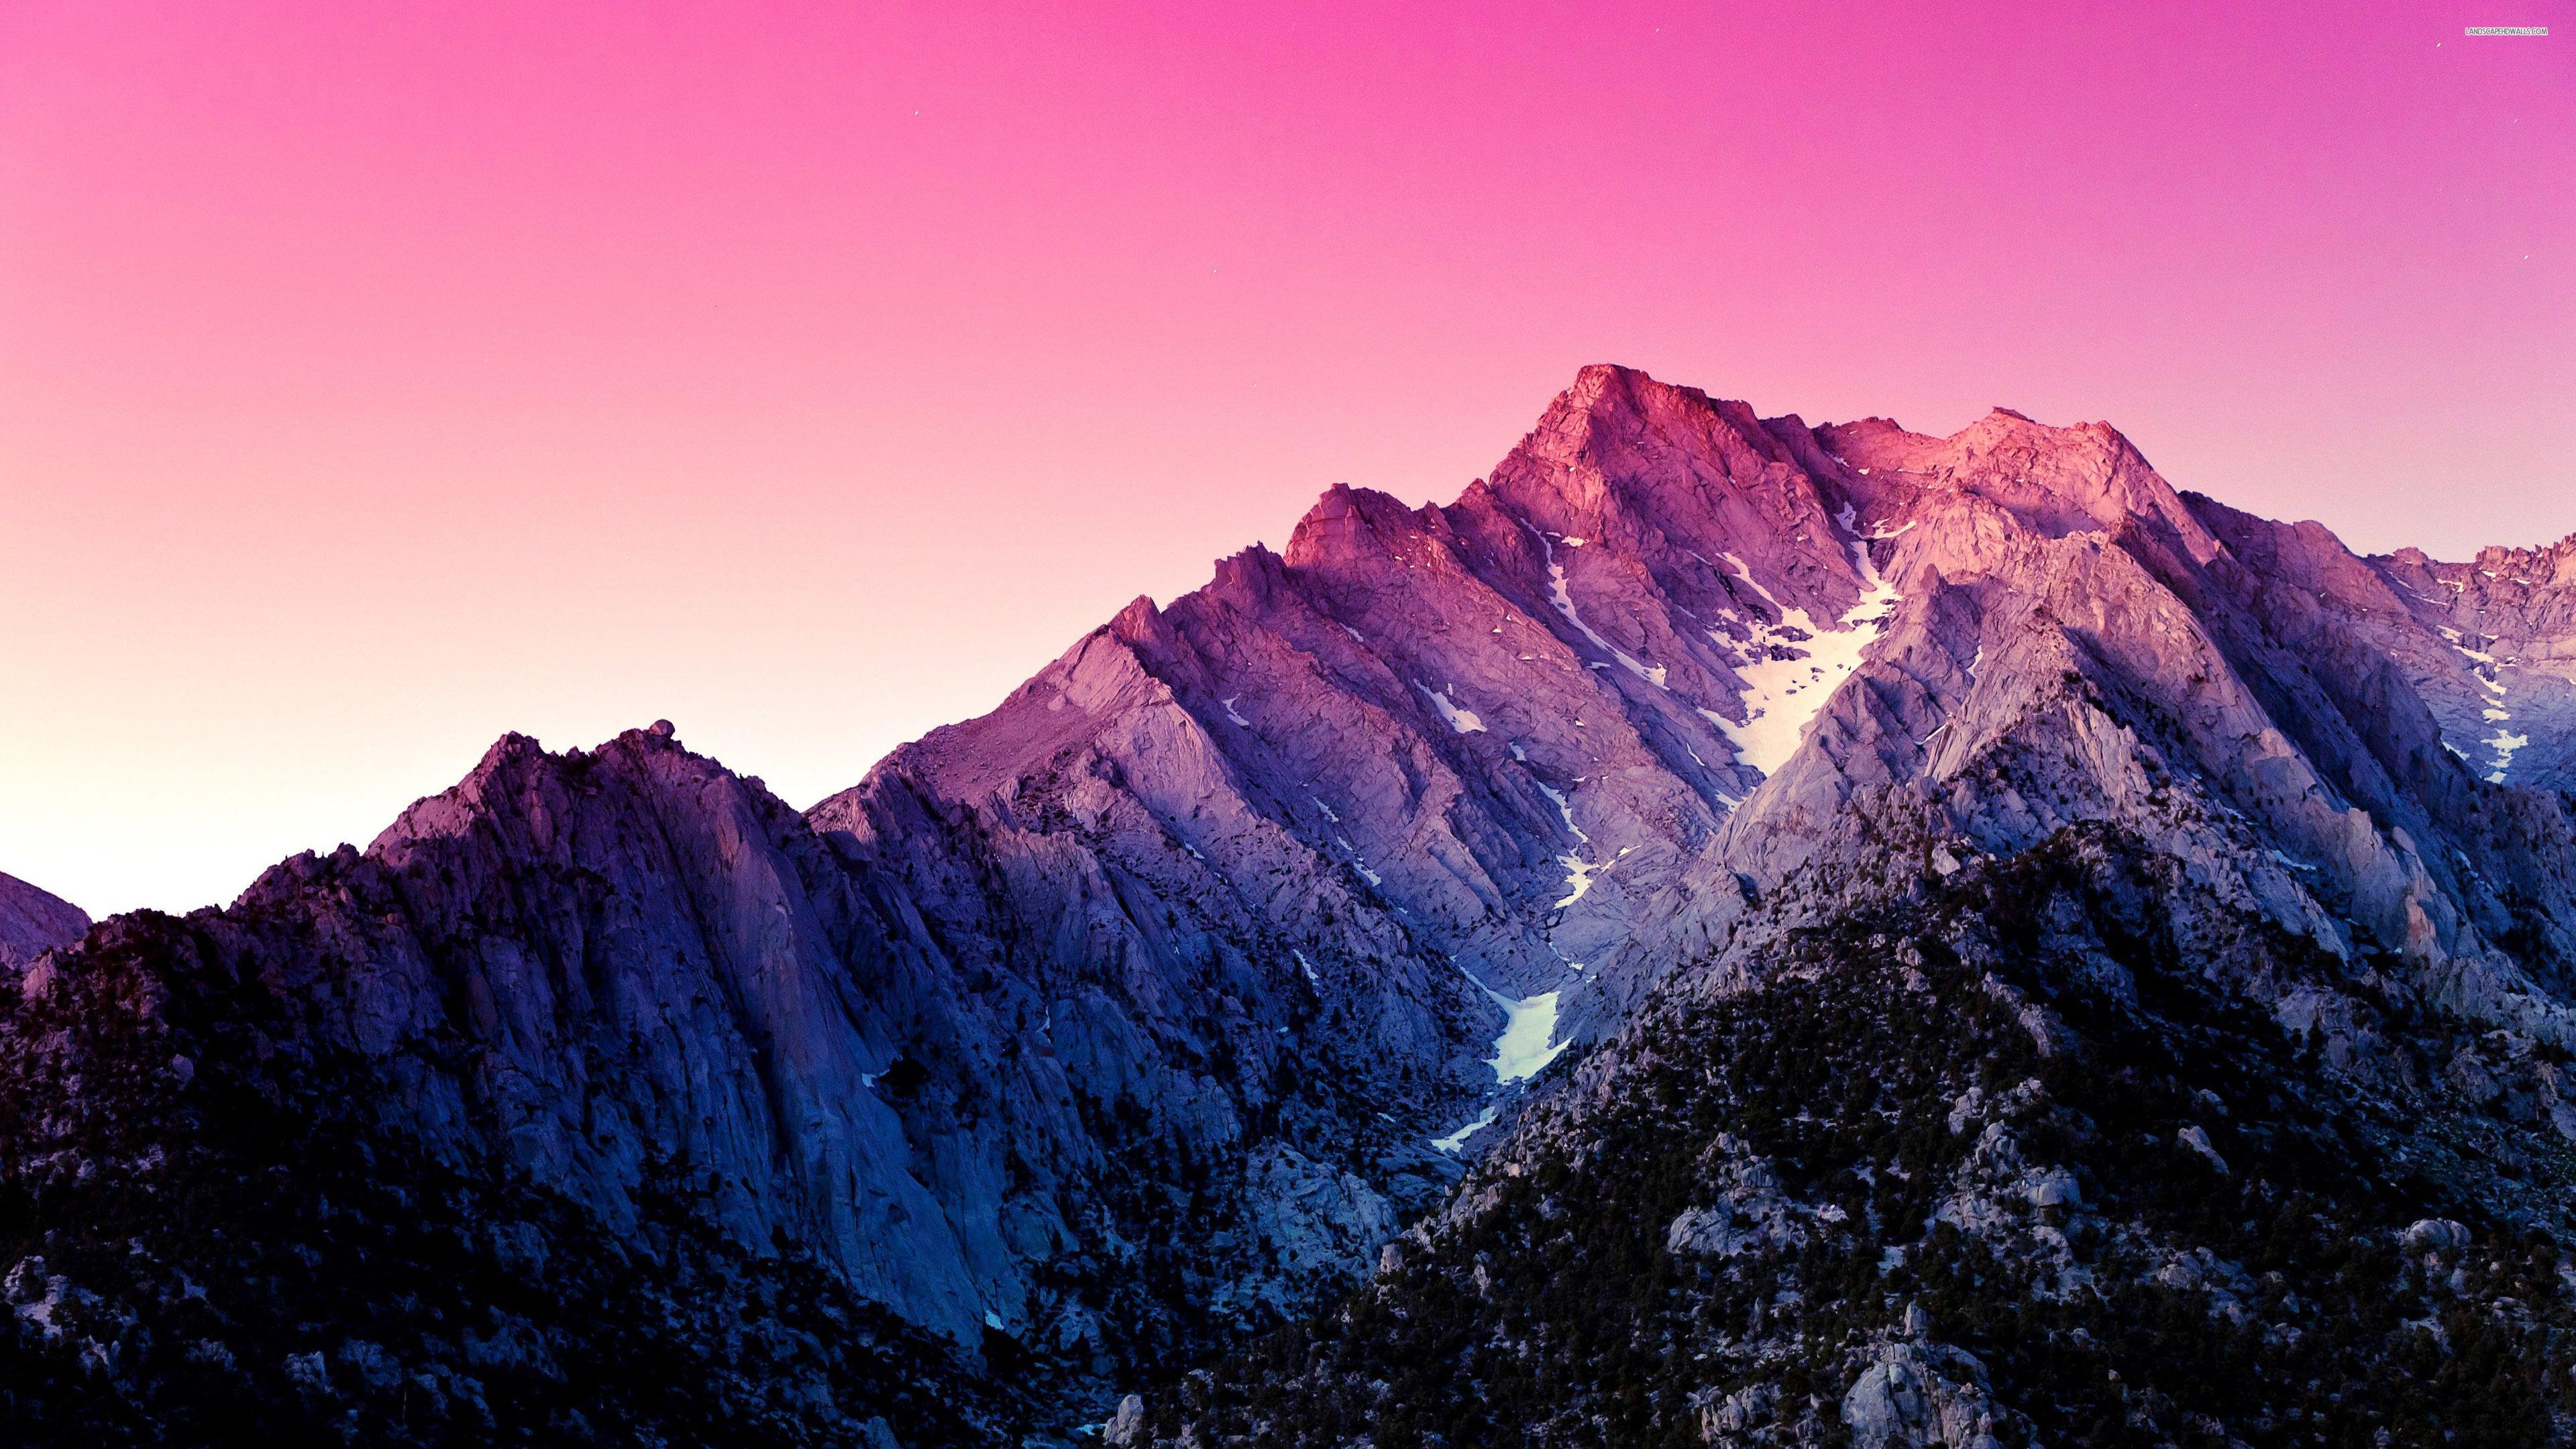 4K Mountain Wallpaper - WallpaperSafari